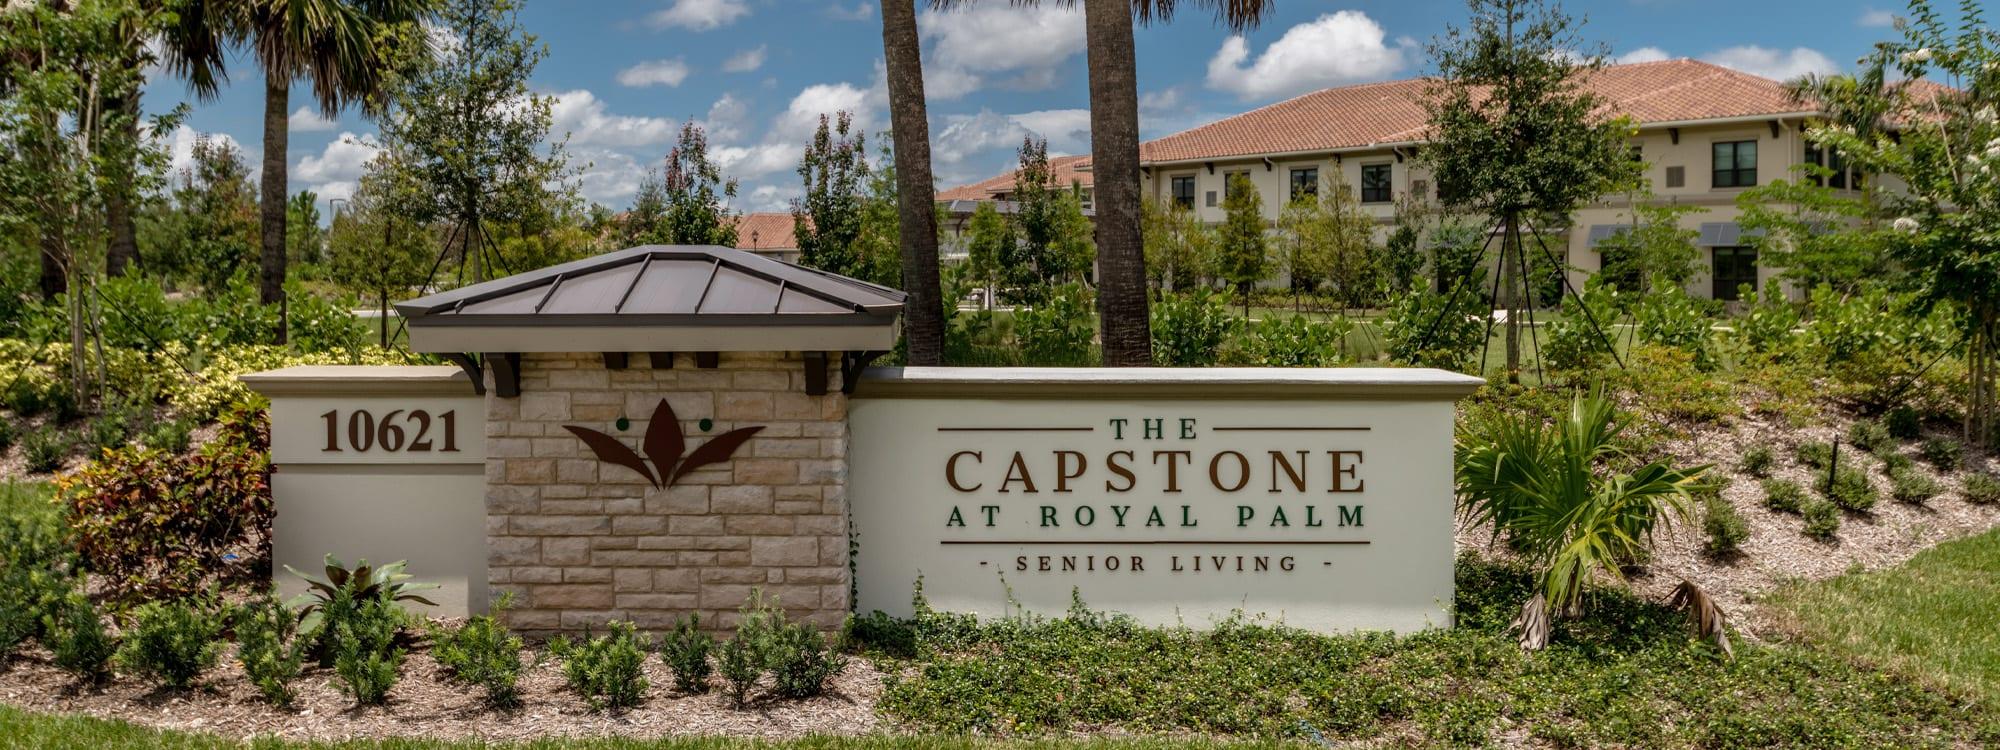 Hunt Midwest Senior Housing Development - Capstone at Royal Palm Beach